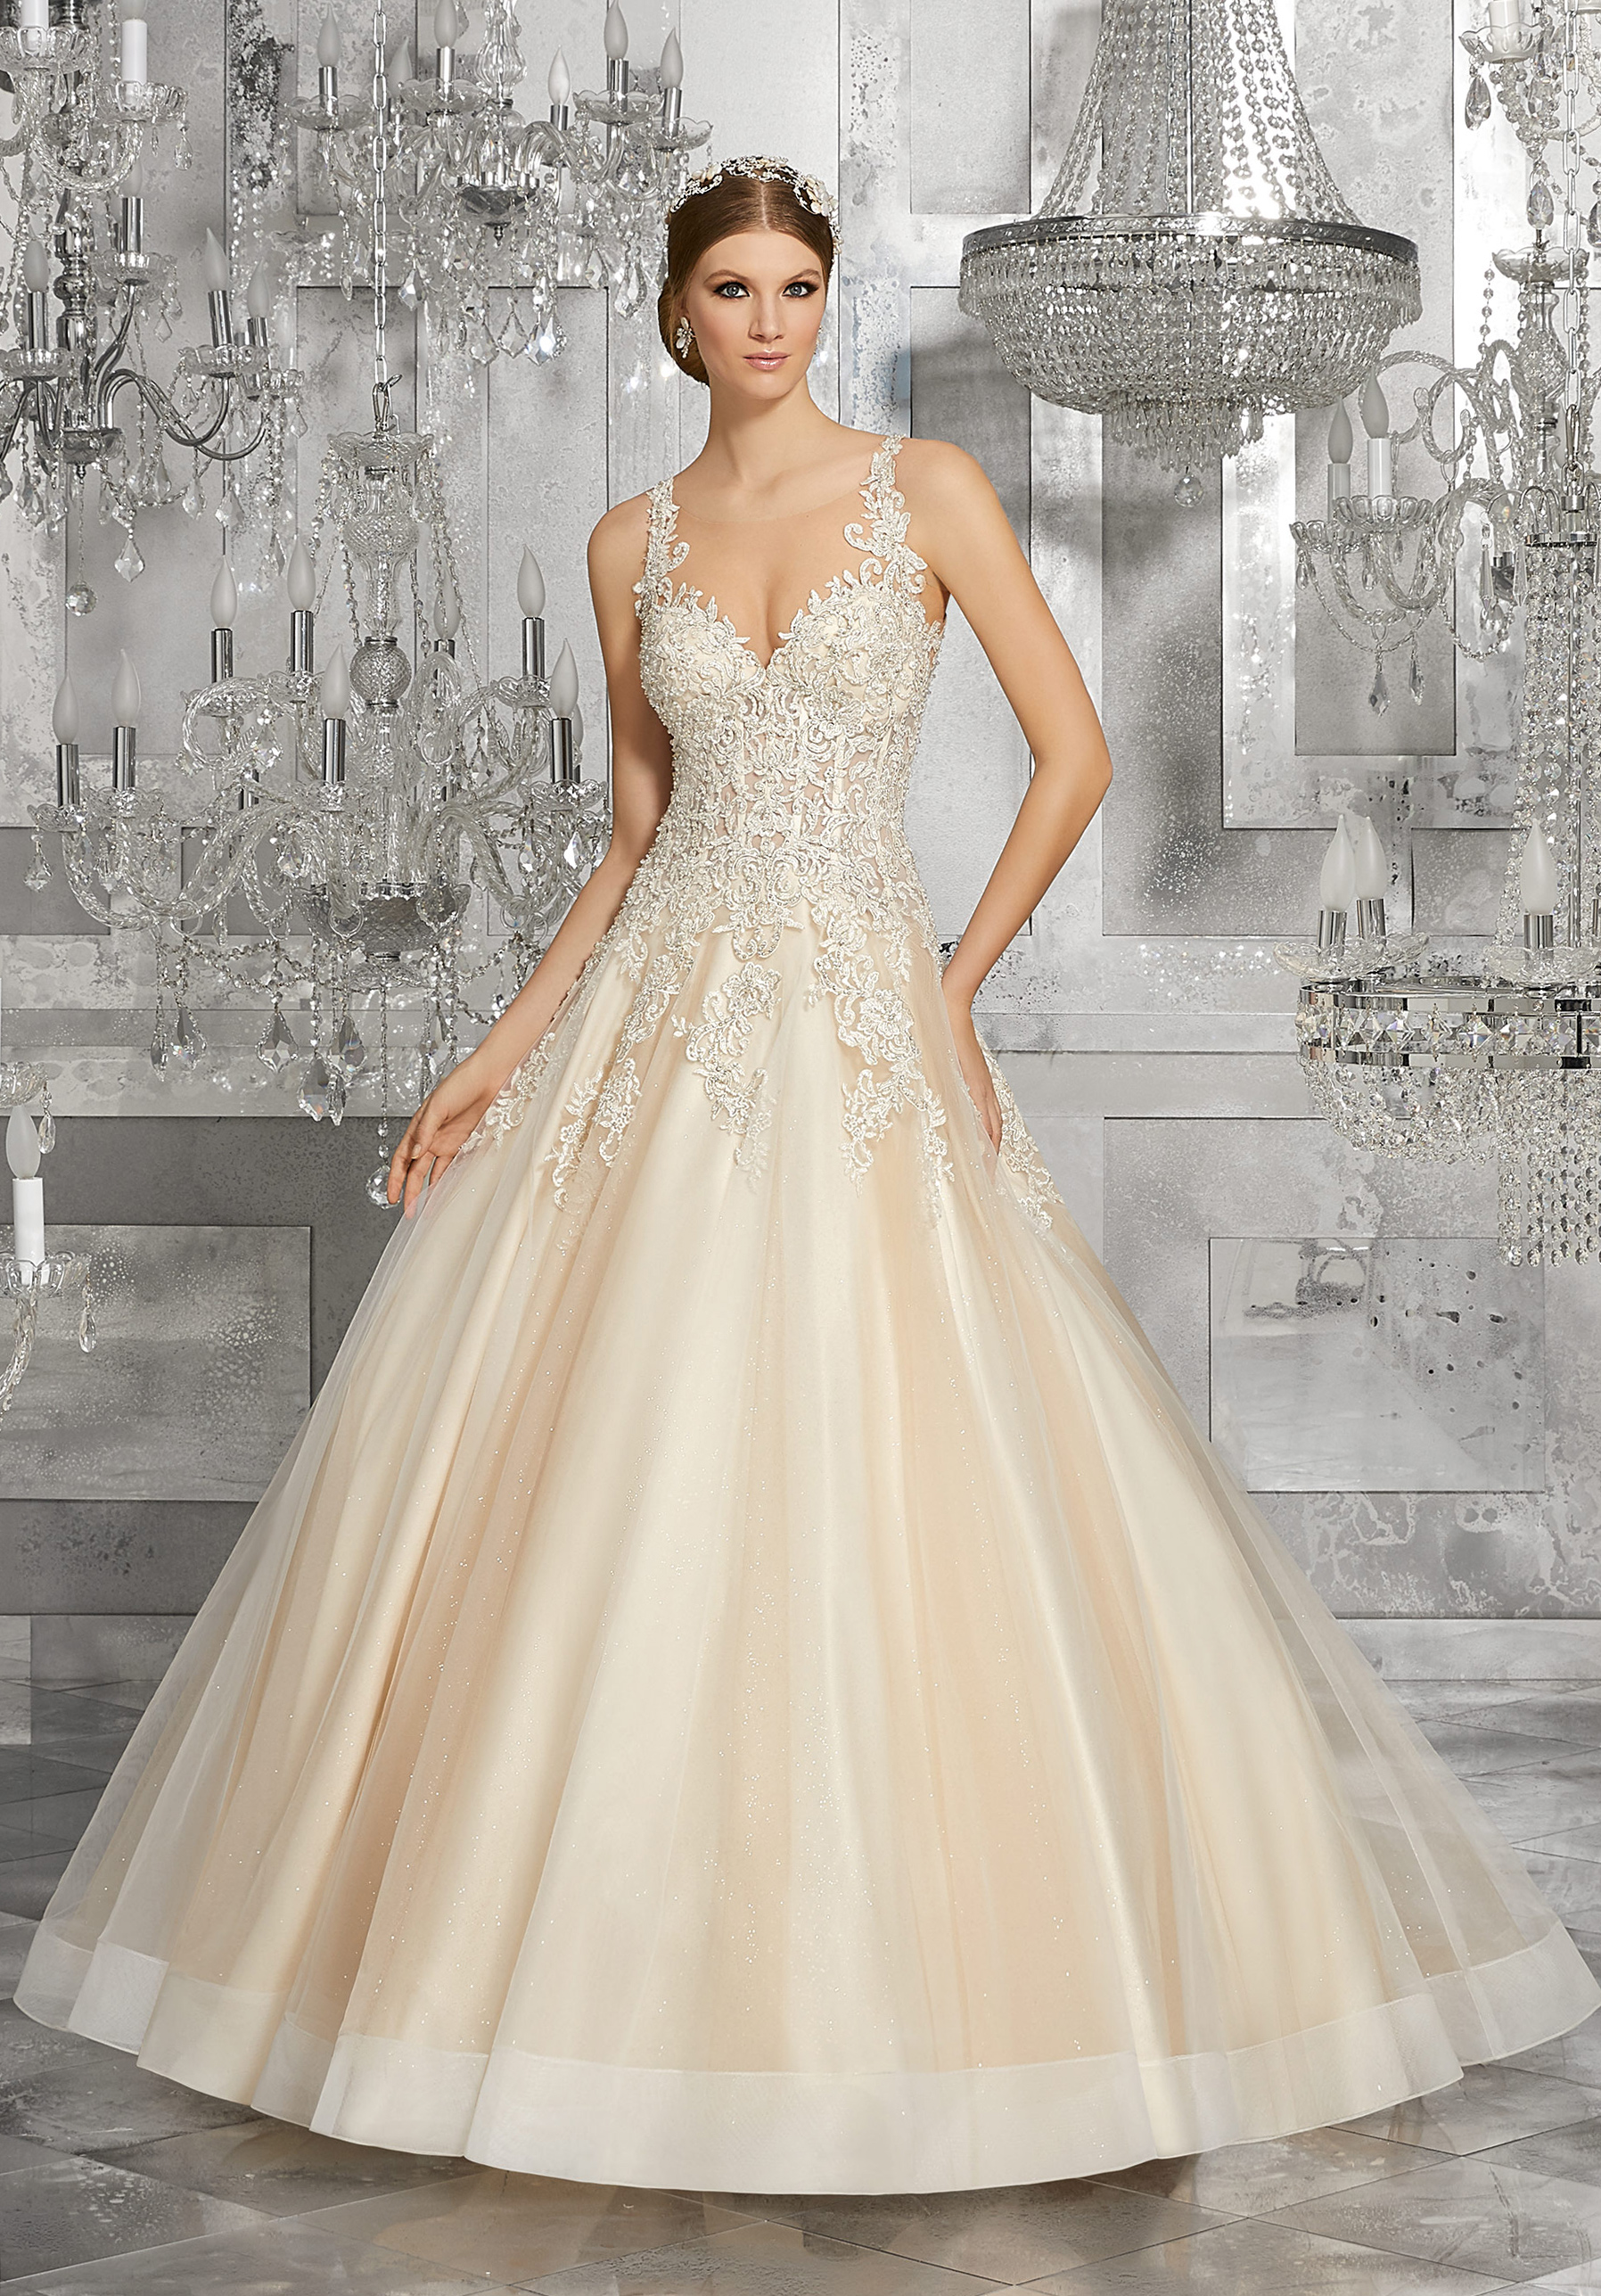 morilee wedding dress spring 2018 blush lace bodice a-line